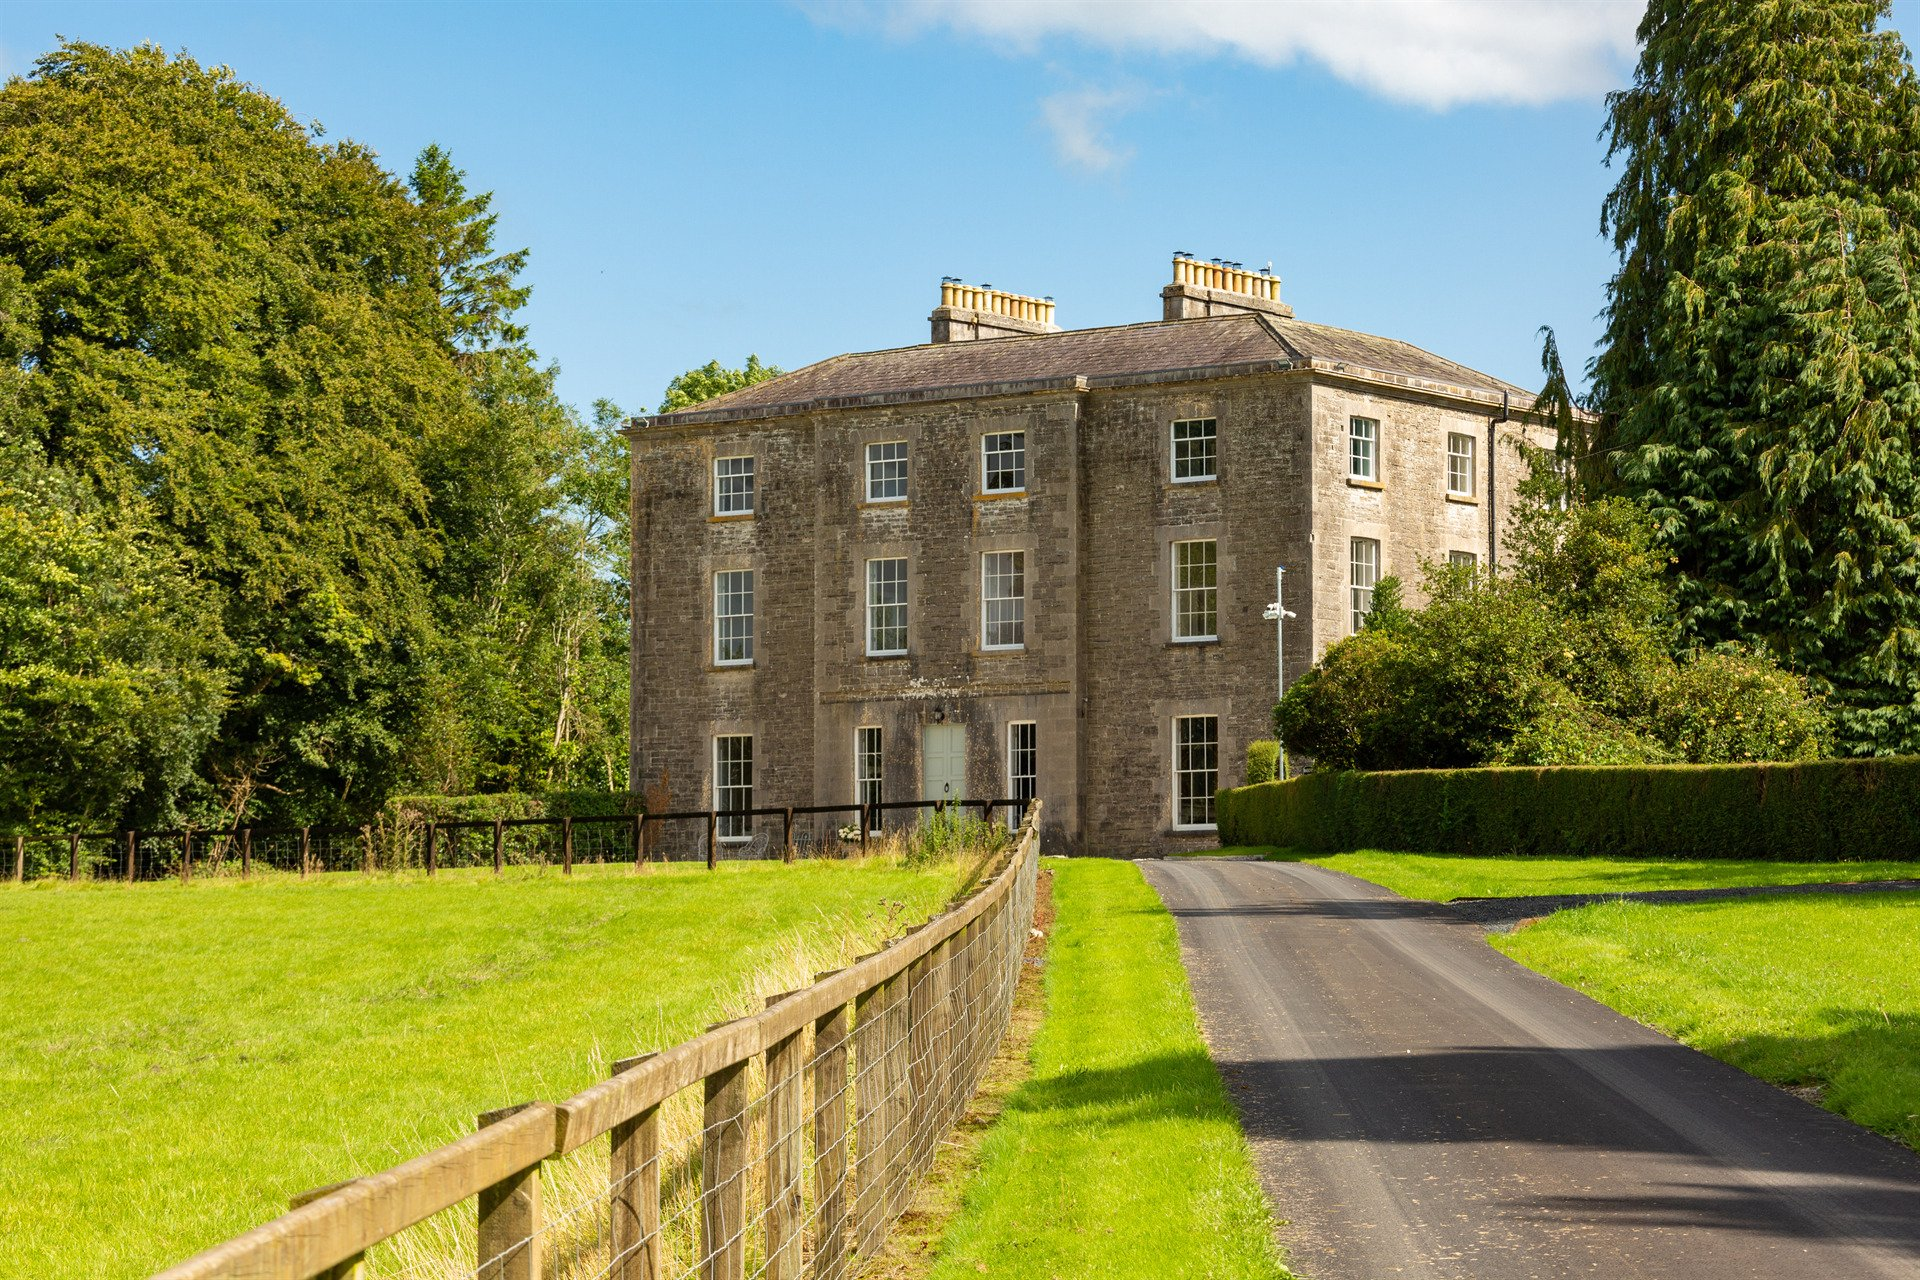 House in Highfield, County Kildare, Ireland 1 - 11598953